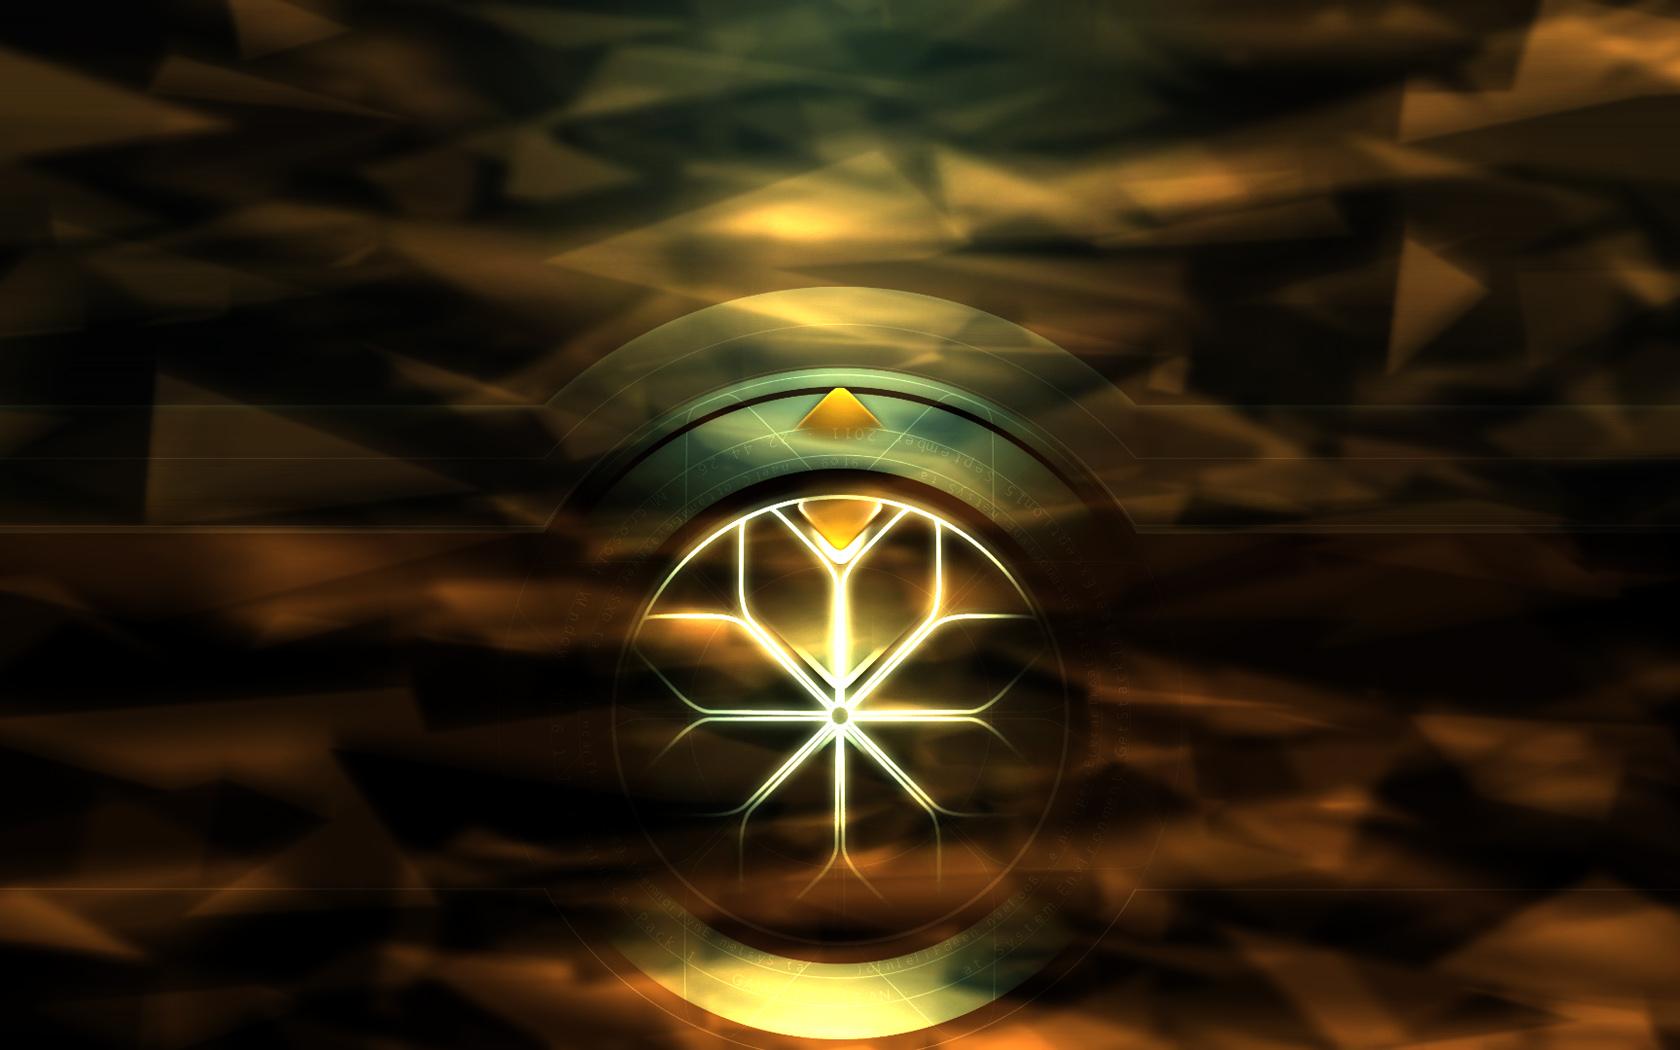 Deus Ex Wallpaper and Background 1680x1050 ID222975 1680x1050